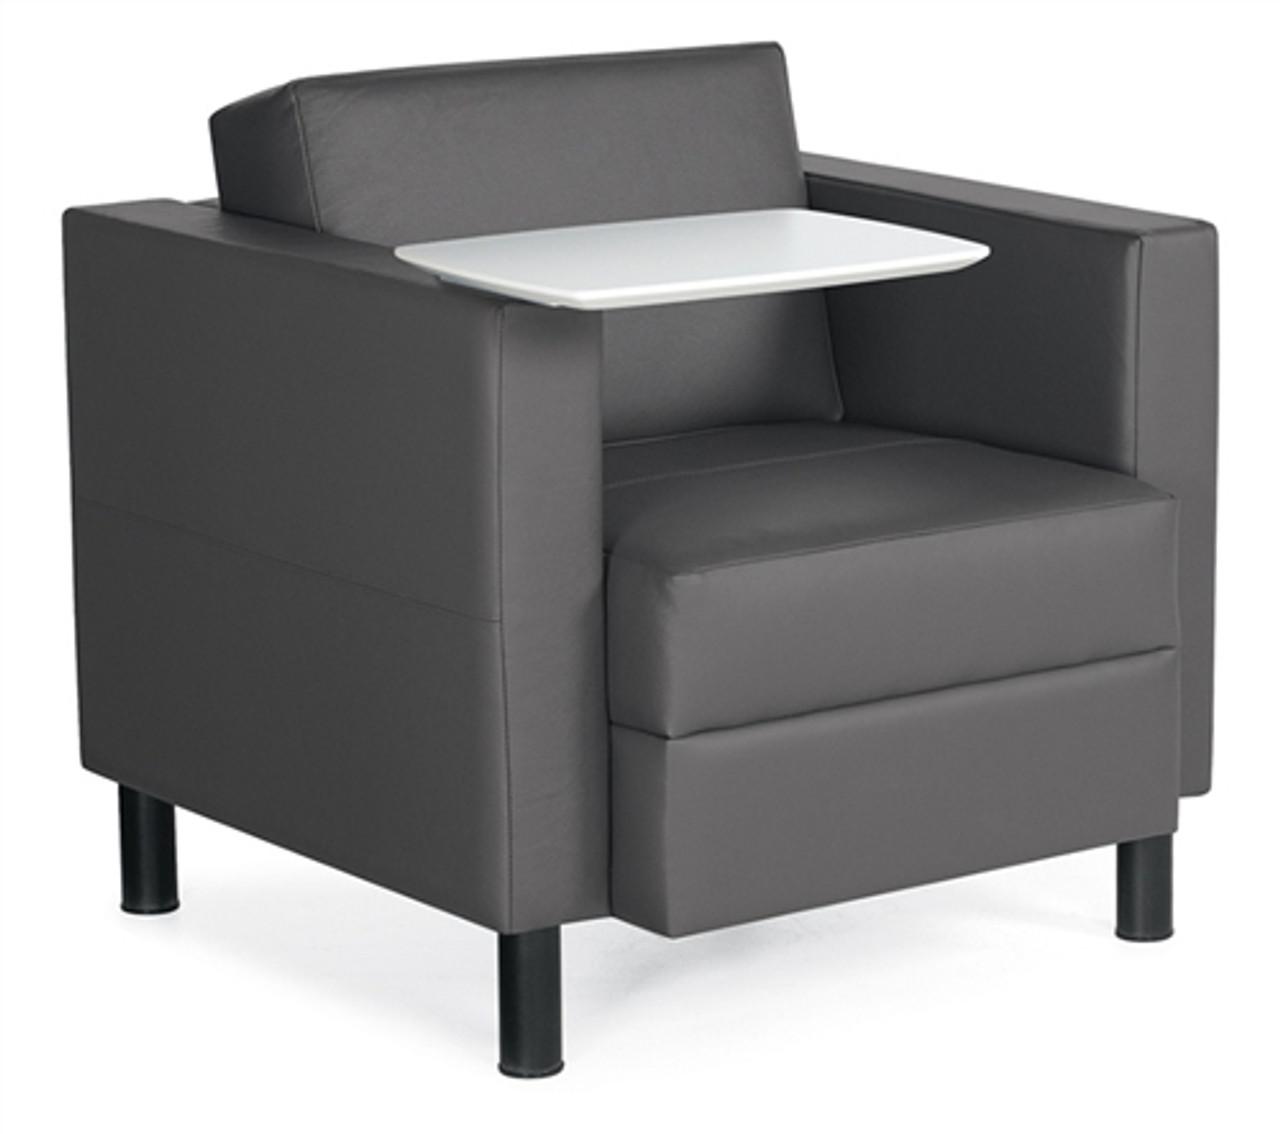 Fine Global Citi Series Tablet Arm Leather Lounge Chair 7875Lfltl Ibusinesslaw Wood Chair Design Ideas Ibusinesslaworg